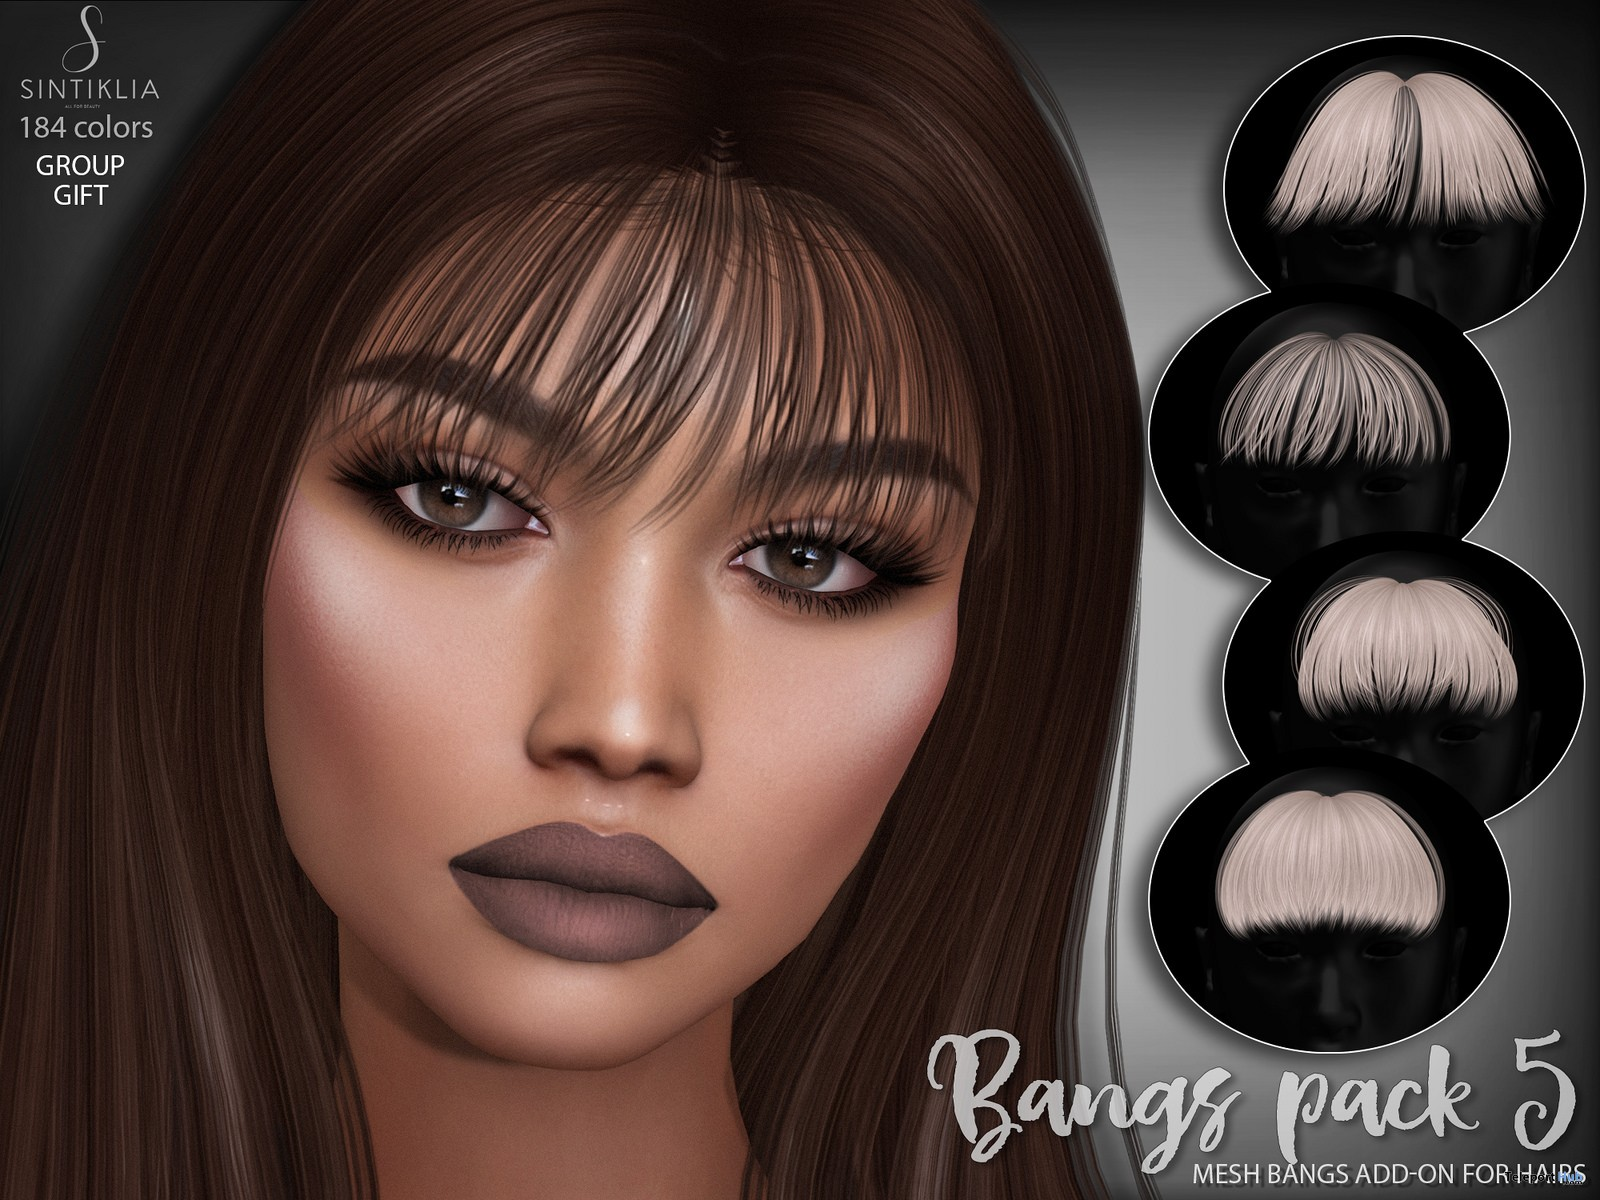 Hair Bangs Pack 5 July 2018 Group Gift by Sintiklia - Teleport Hub - teleporthub.com